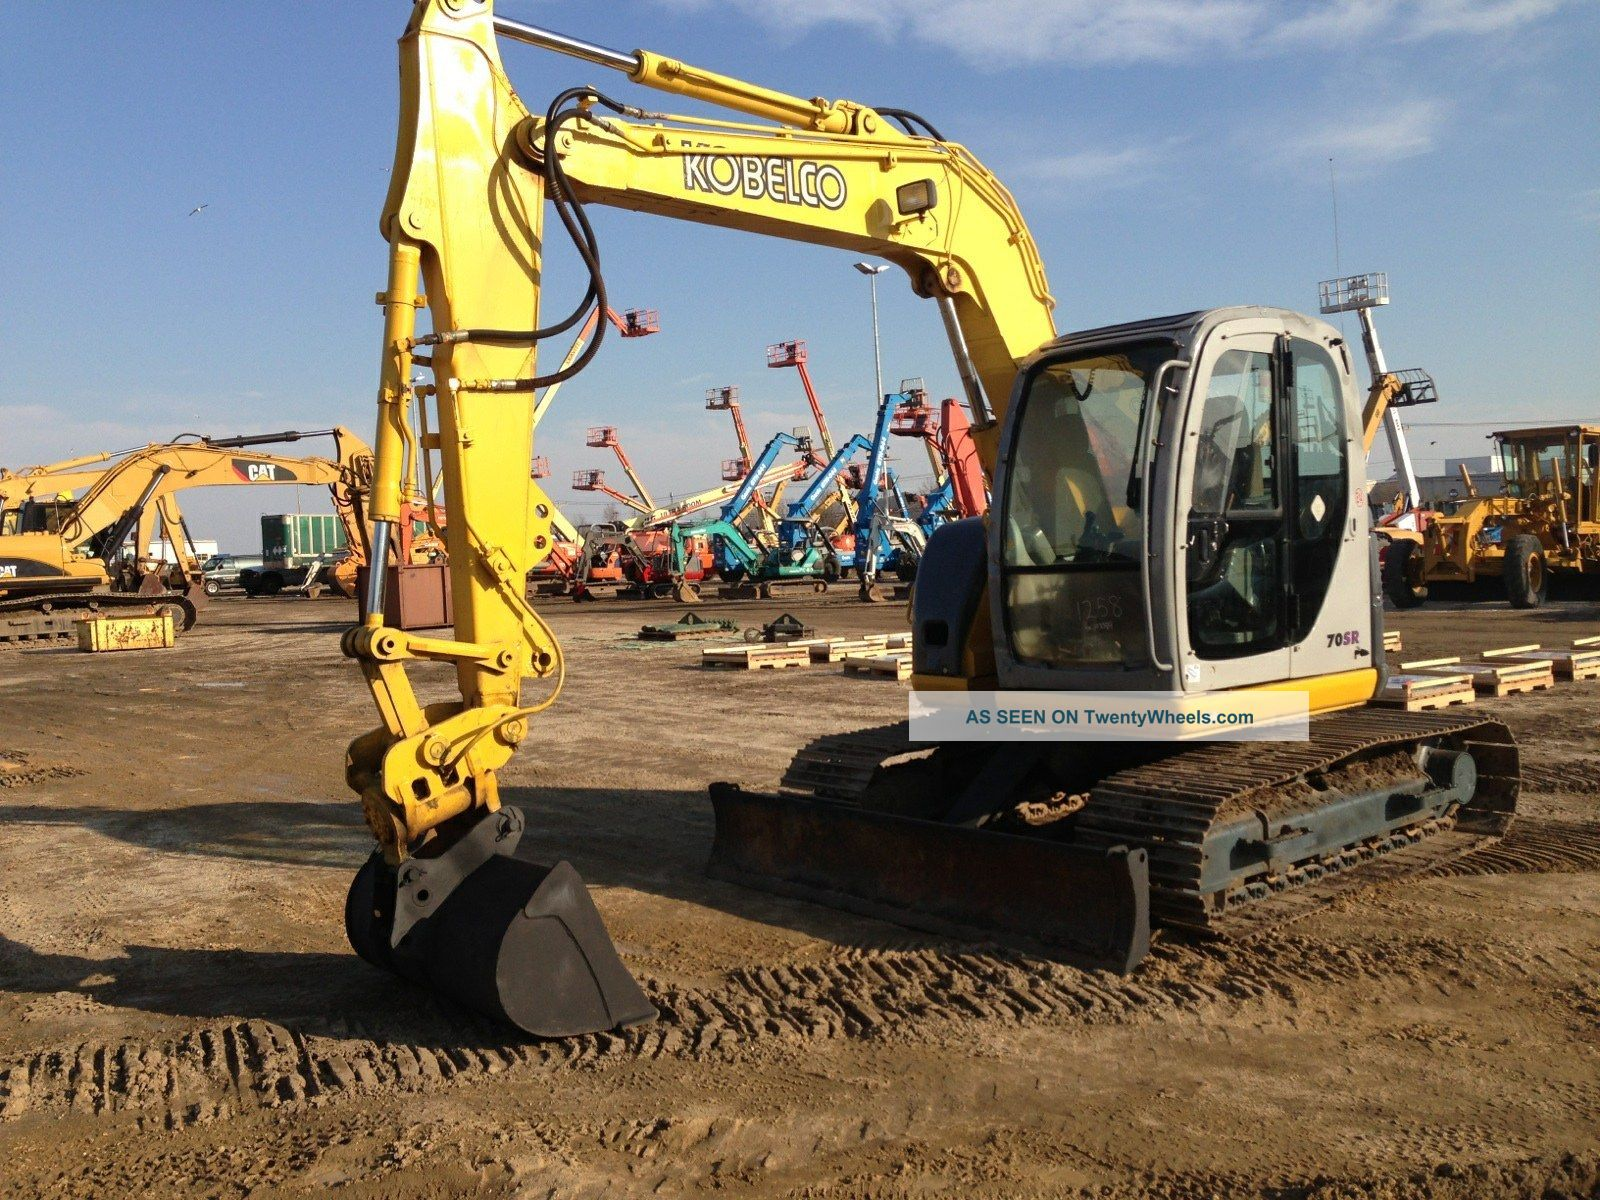 Kobelco Sk70sr Hydraulic Track Excavator Dozer Loader Diesel Cat Power Tilt Excavators photo